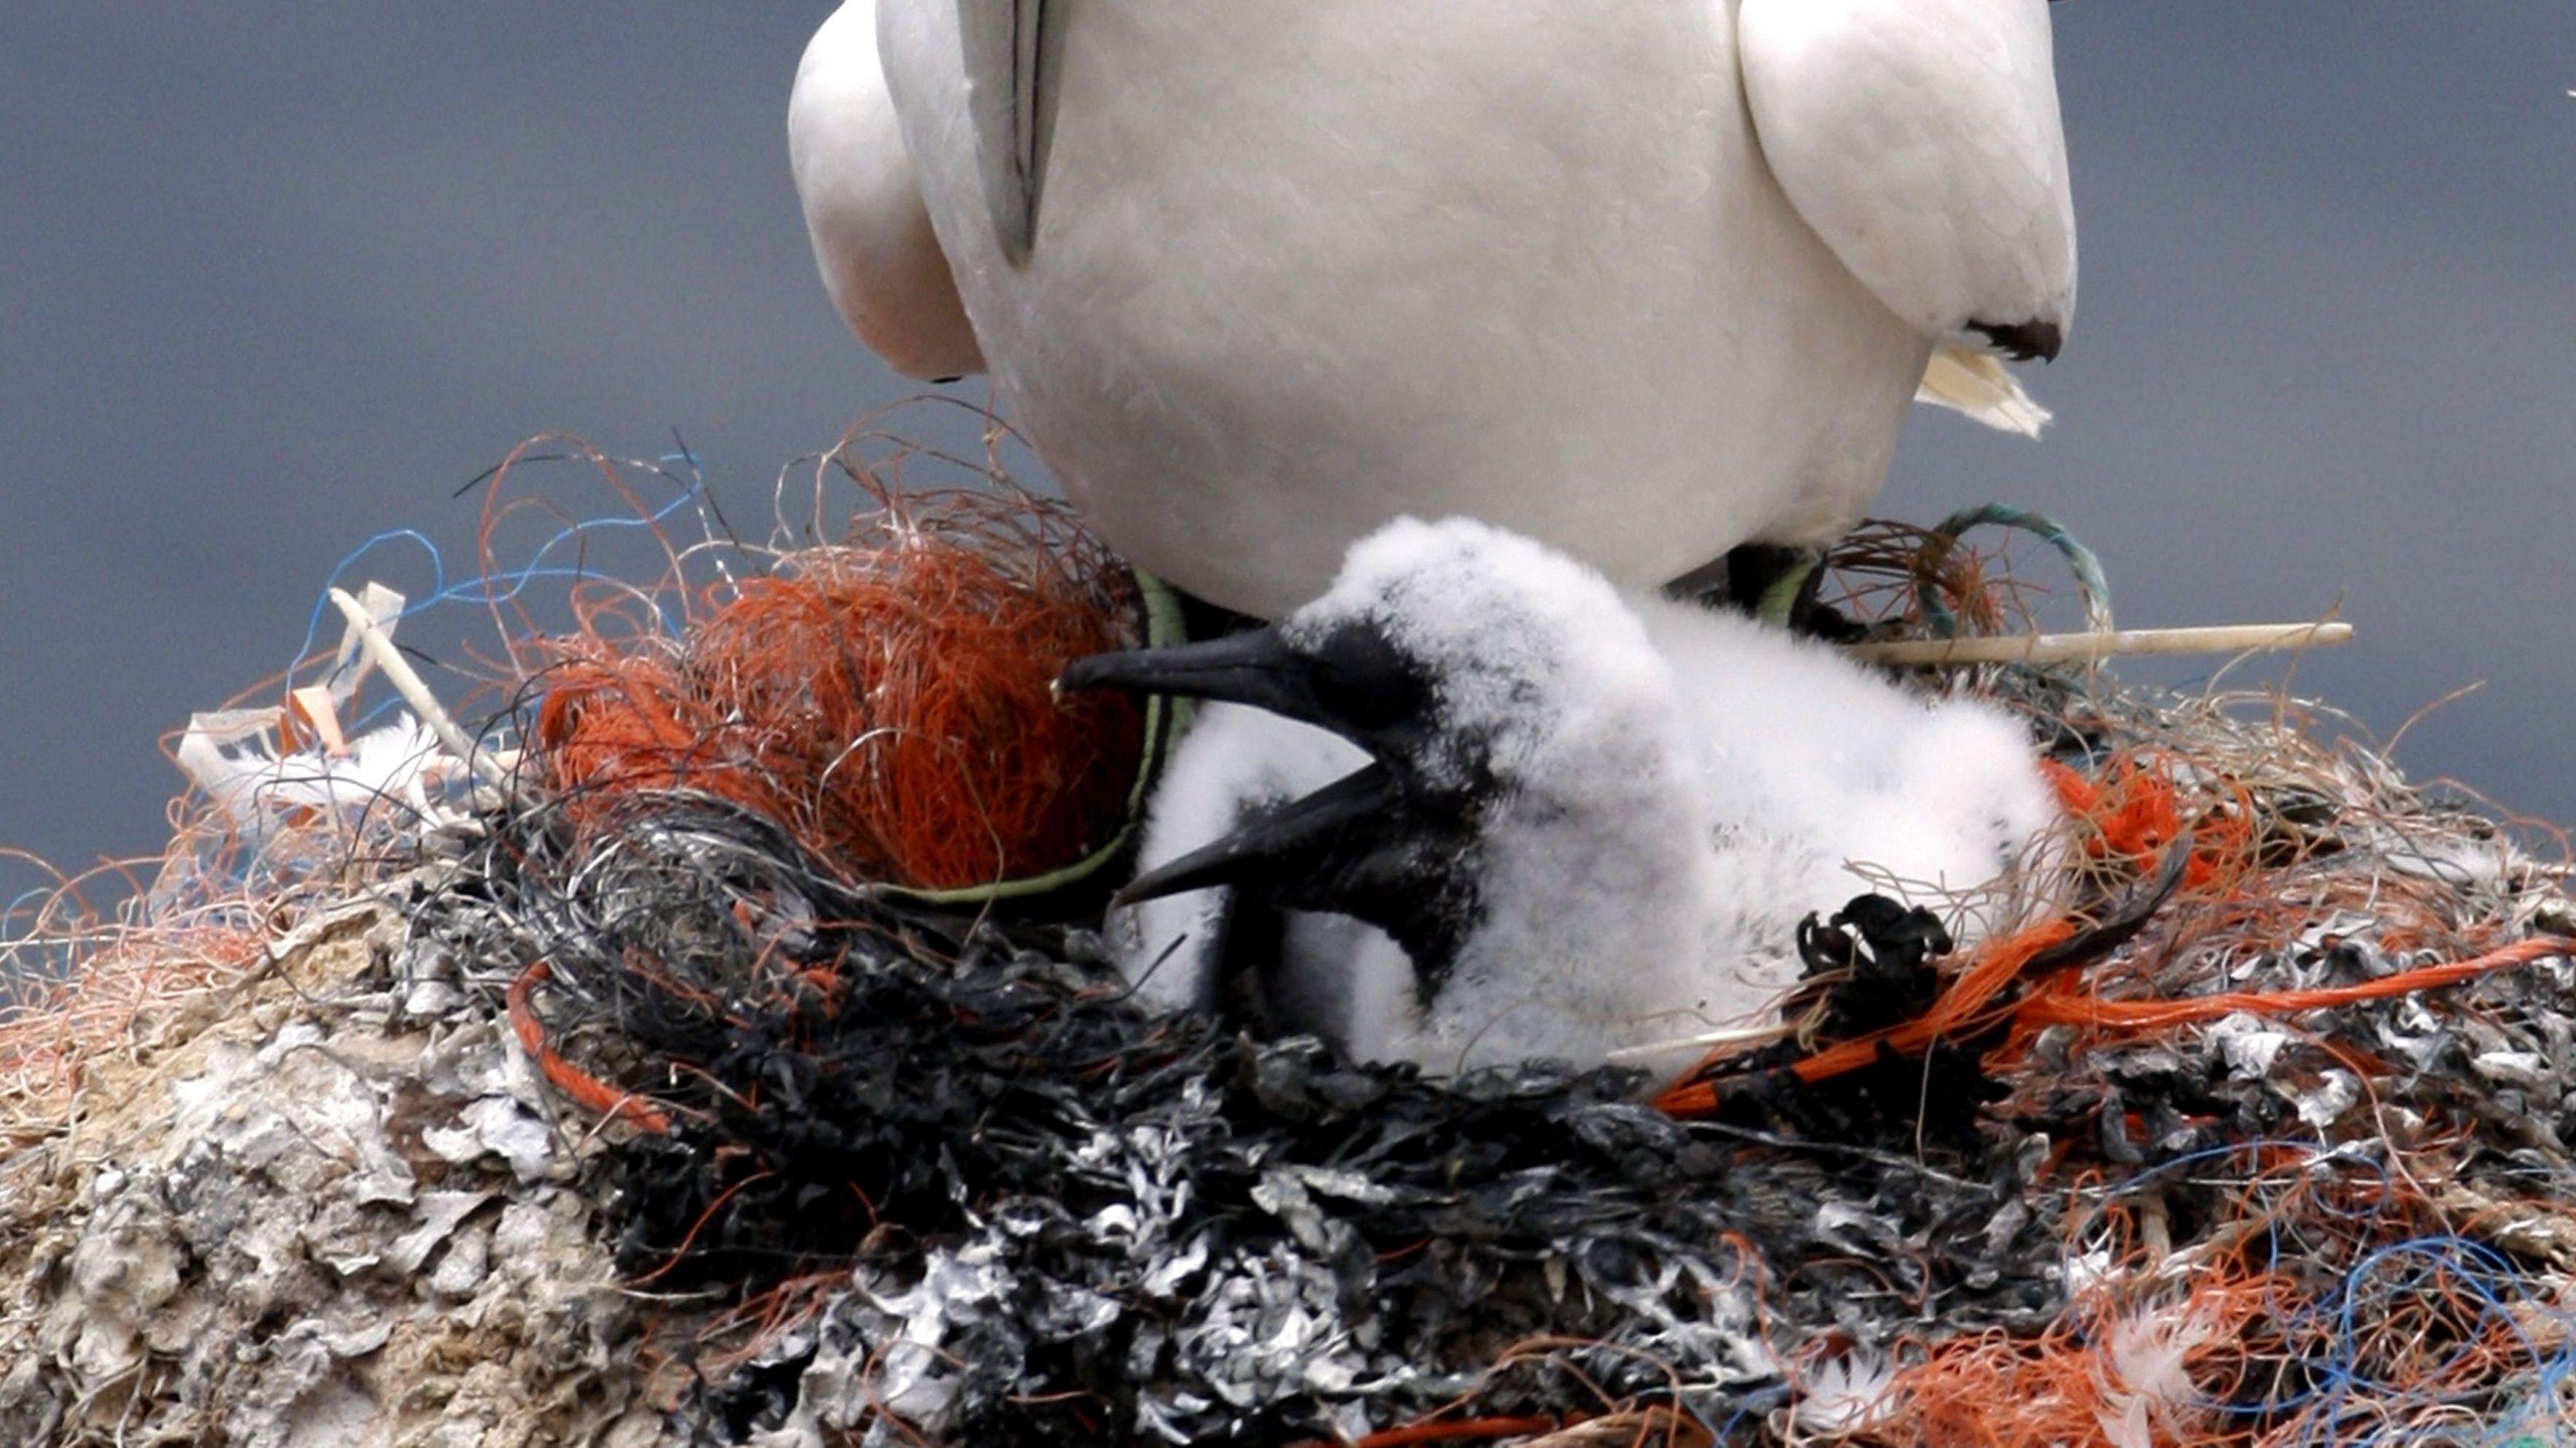 Basstölpelküken in einem Nest voller Plastik